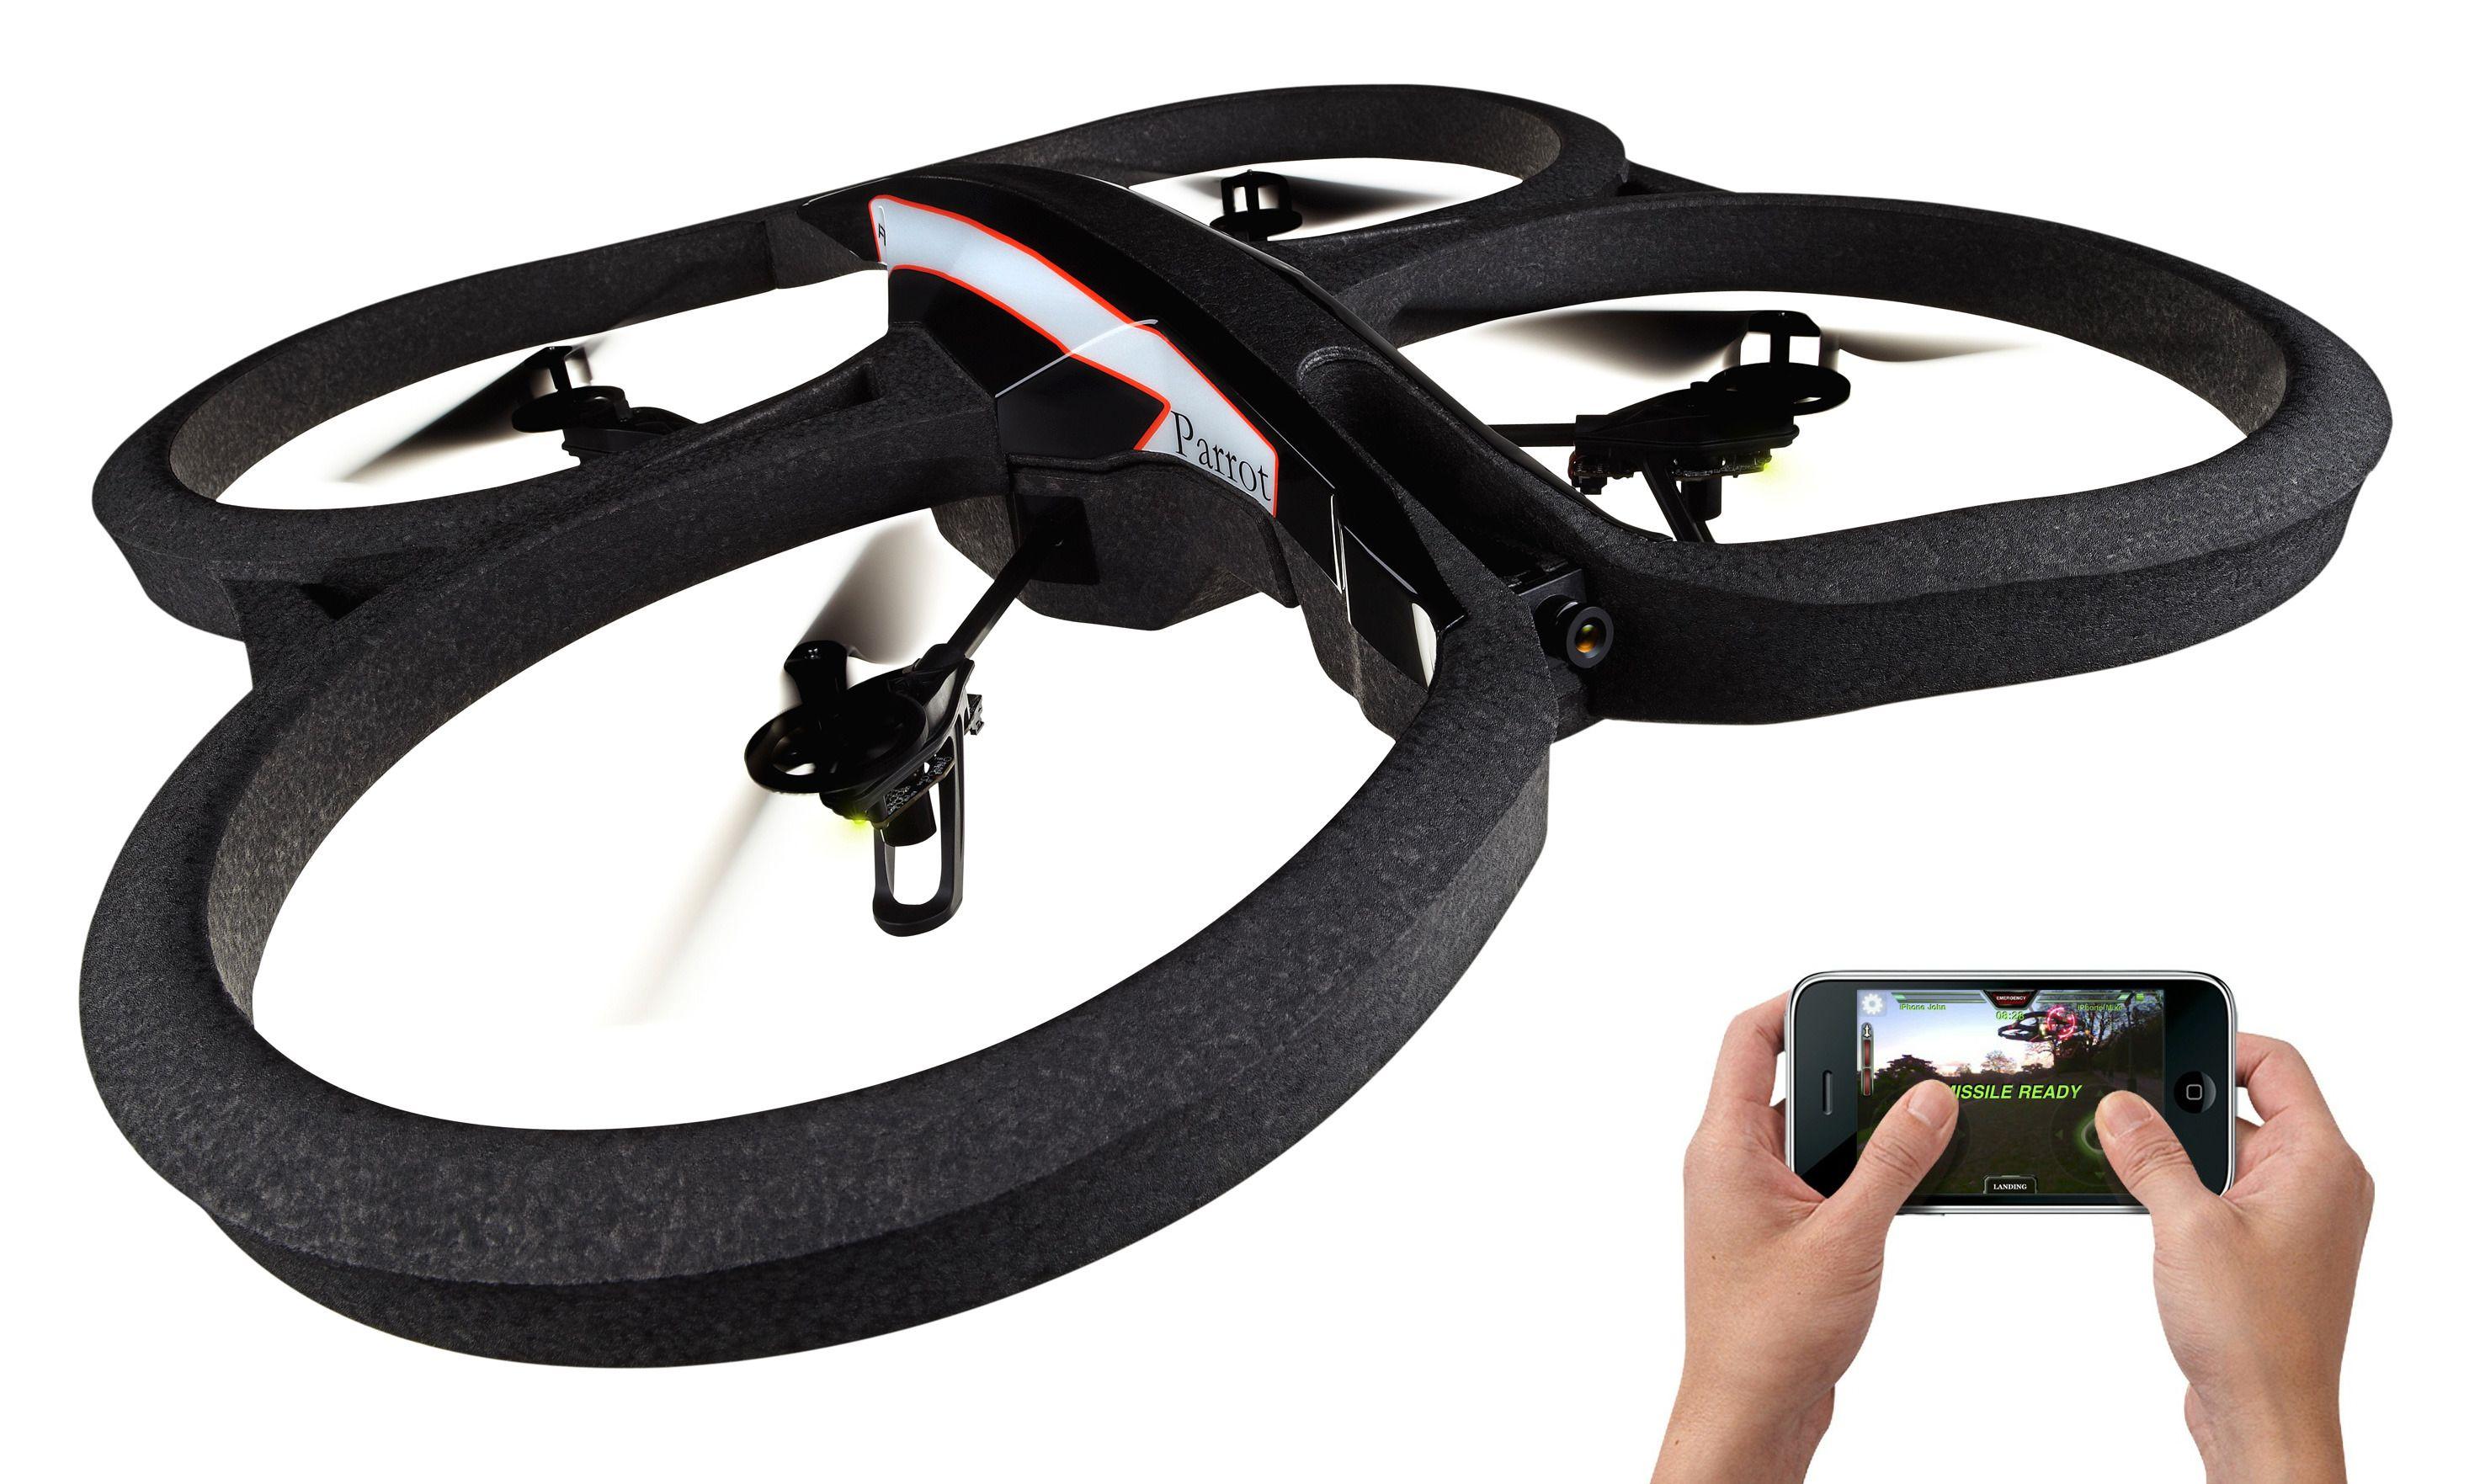 Parrot AR Drone 2.0.